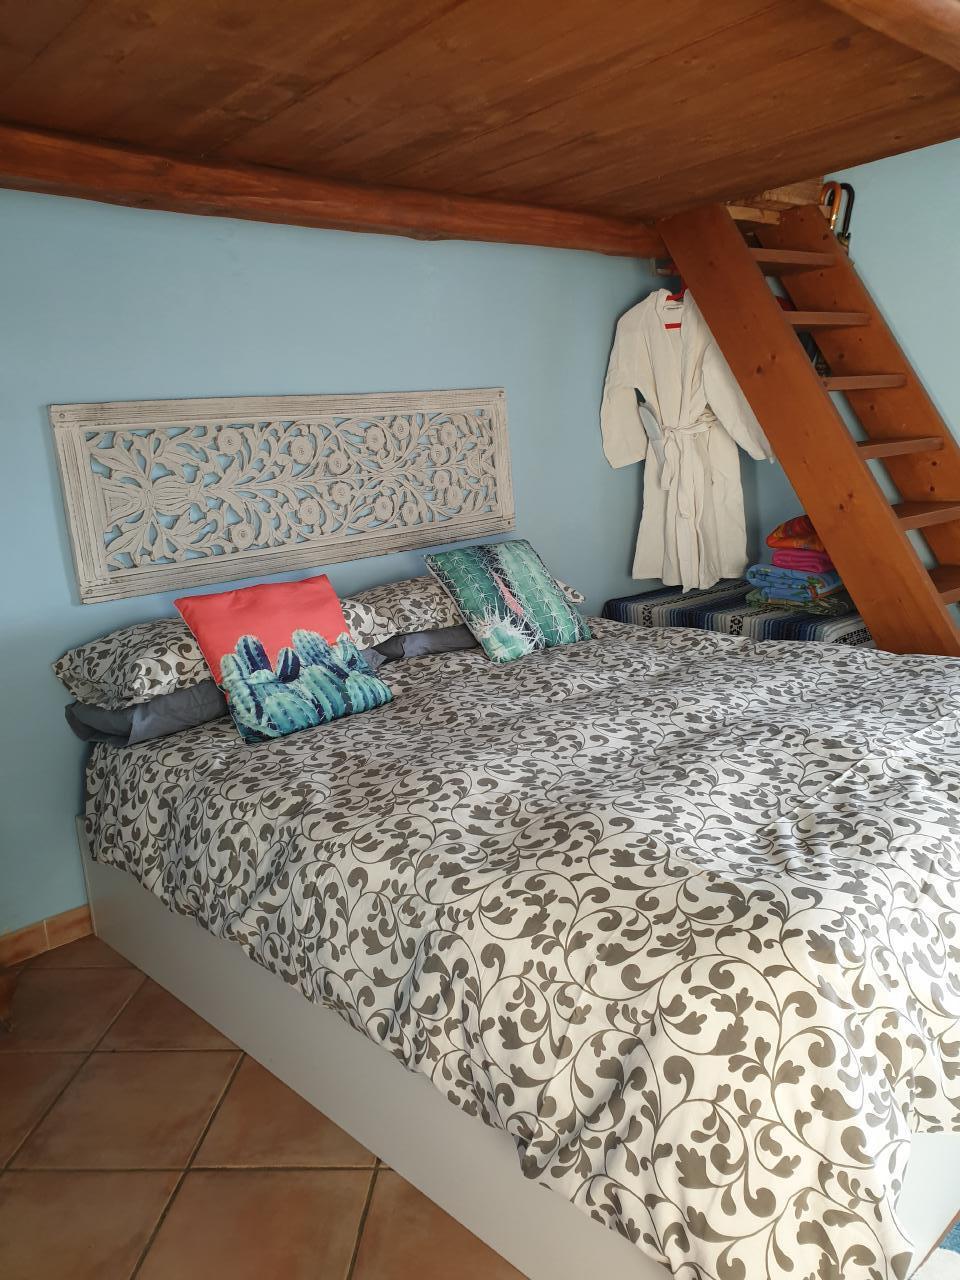 Maison de vacances Casetta Eoliana Lipari Inseln, pool, sauna. (827872), Lipari, Lipari, Sicile, Italie, image 22